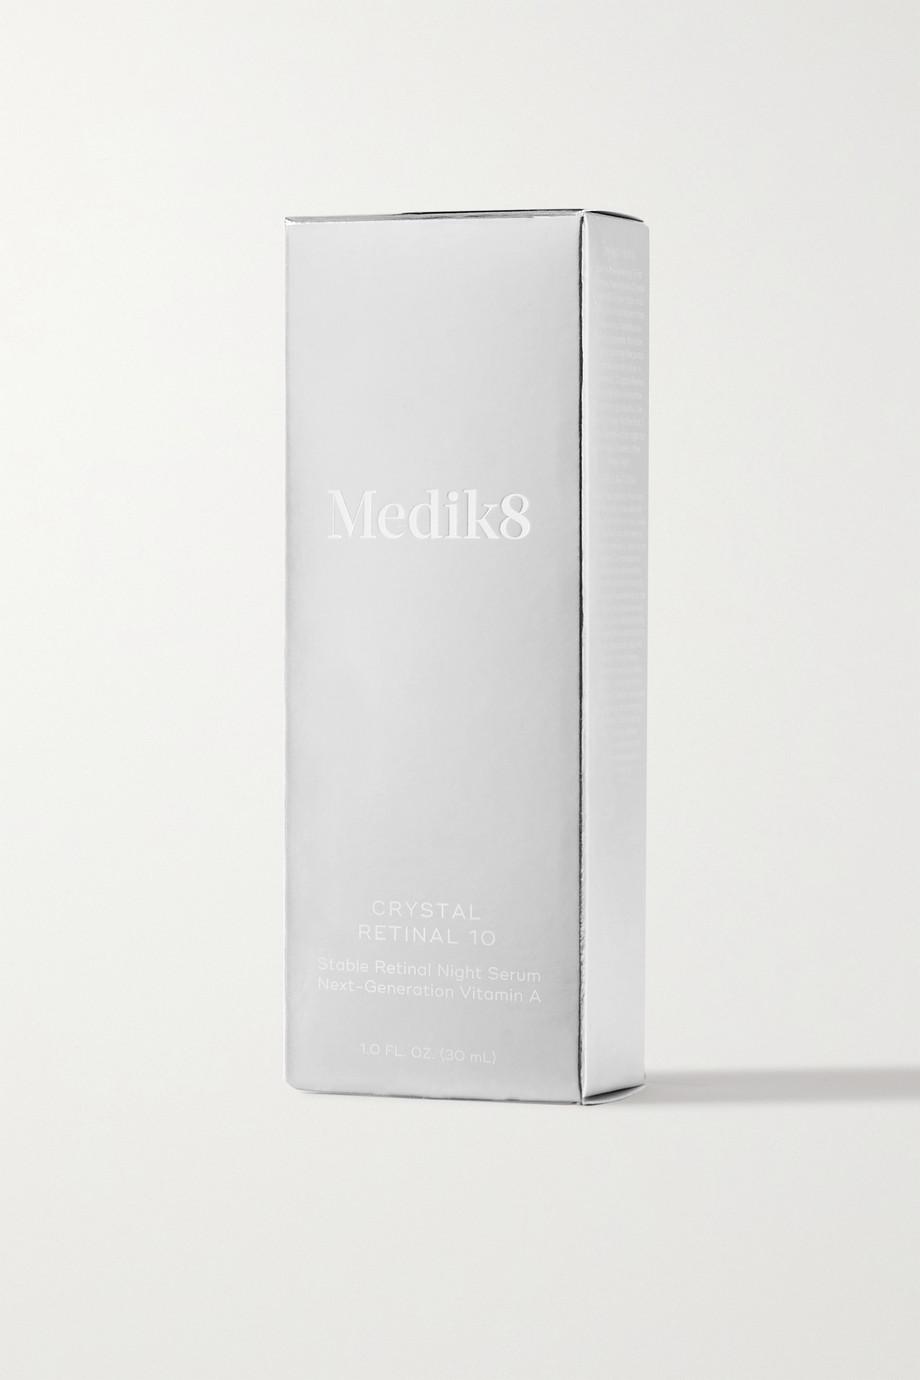 Medik8 Sérum de nuit au rétinal stable Crystal Retinal 10, 30 ml